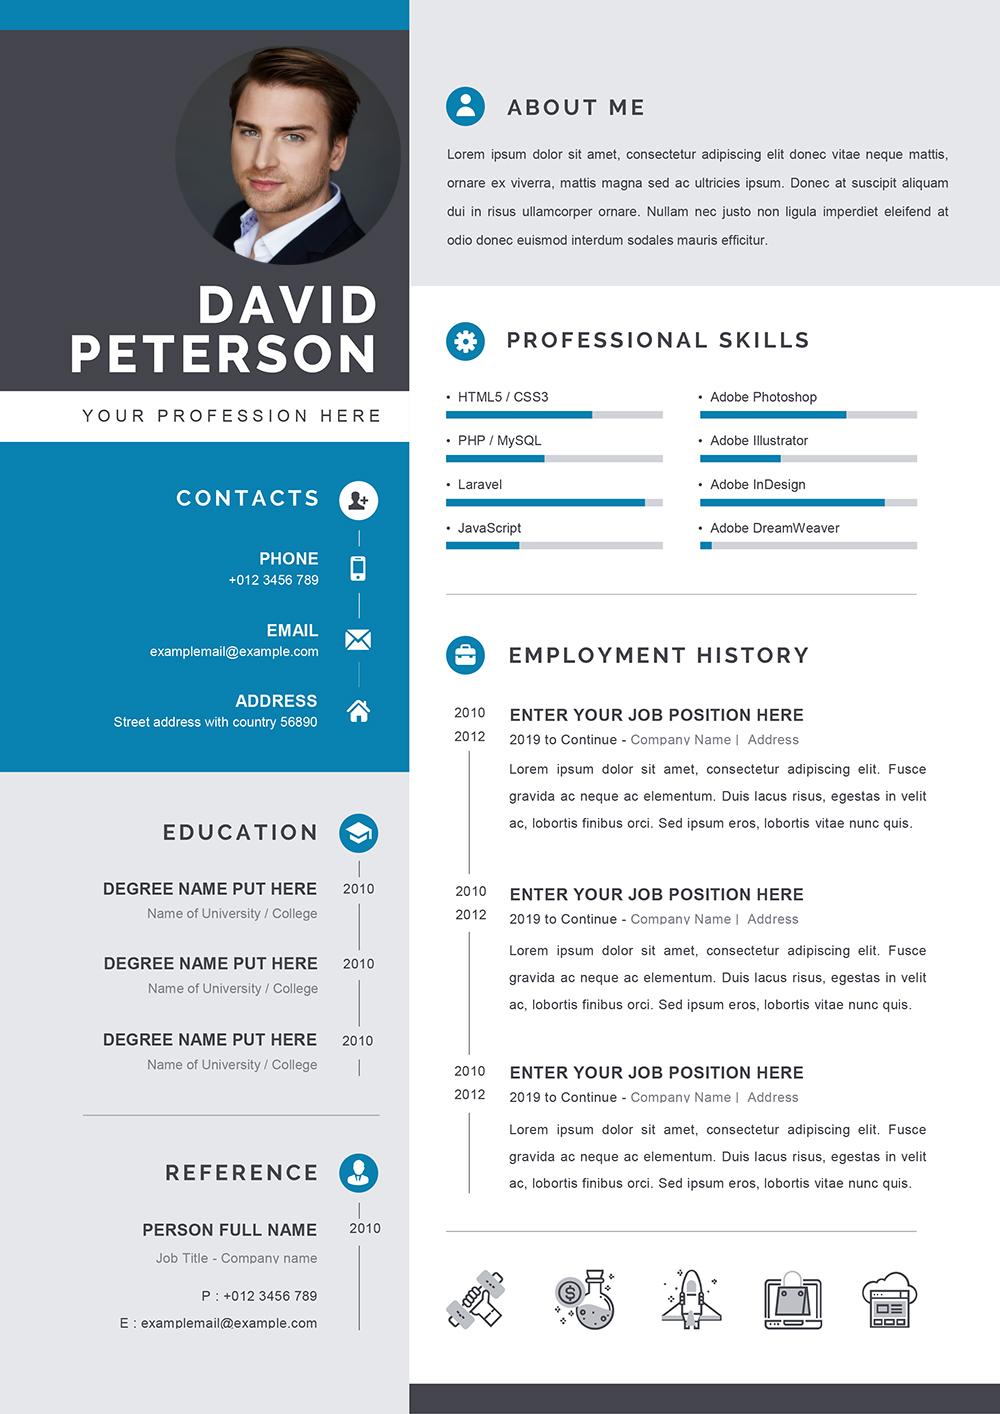 Professional CV Template in Word Format - Editable CV Word